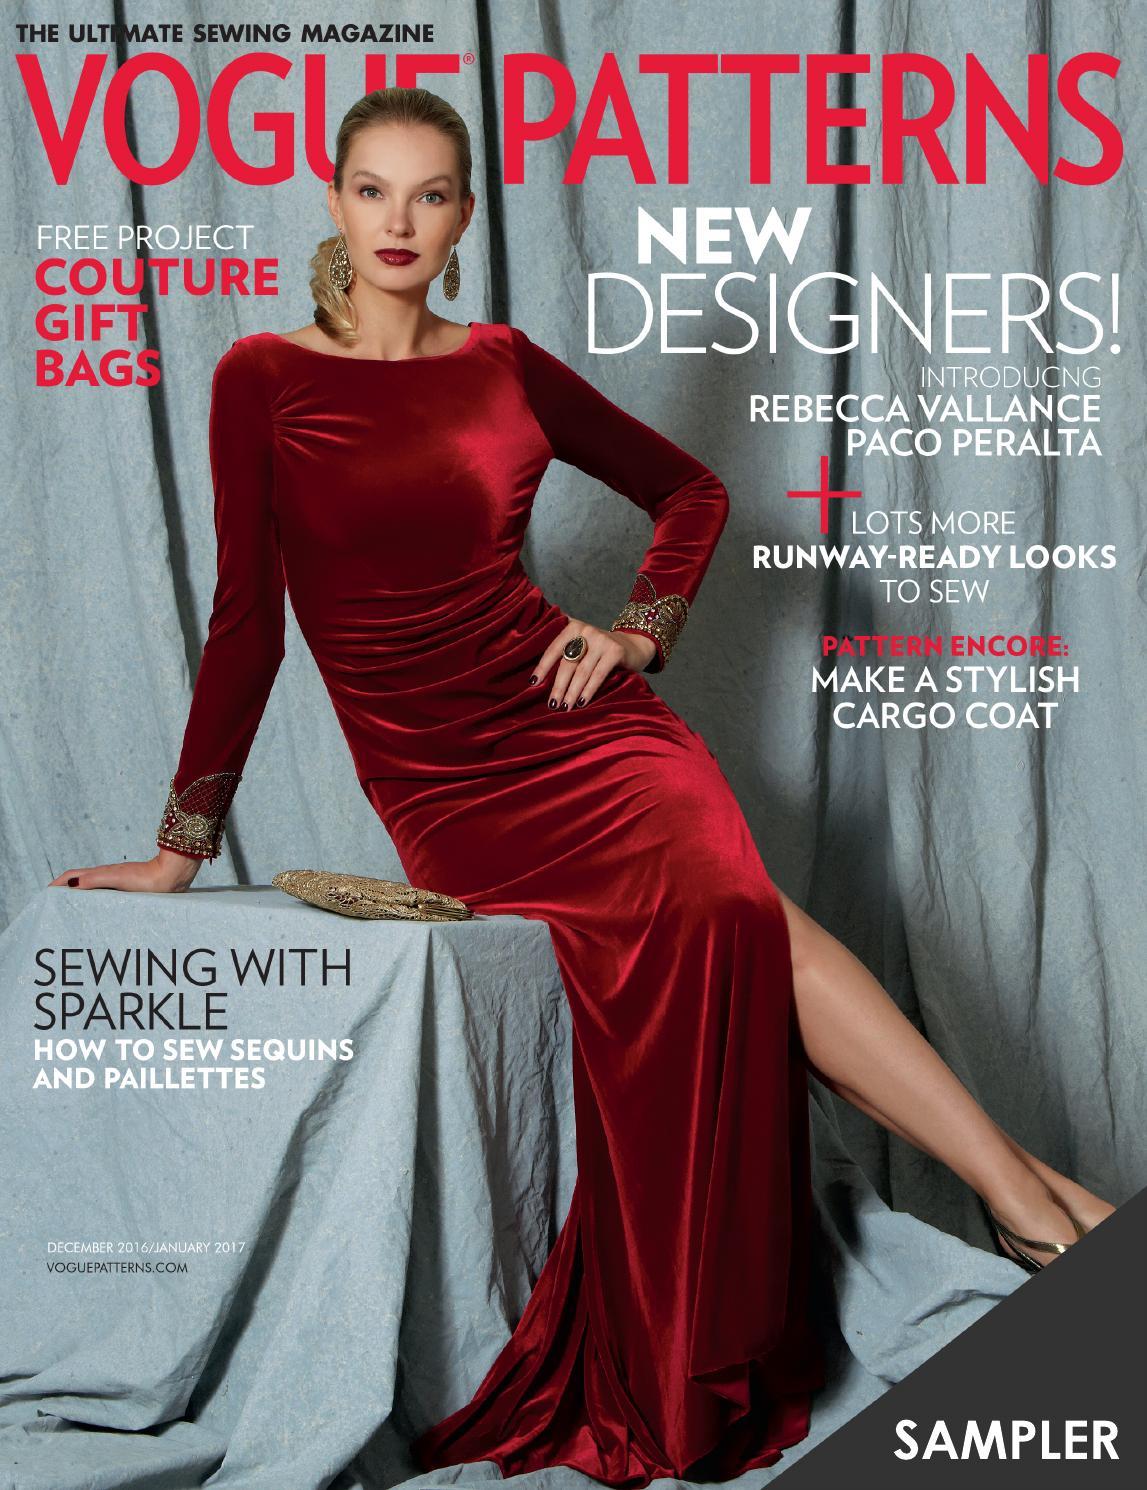 Vogue Patterns Magazine December 2016/January 2017 Sampler